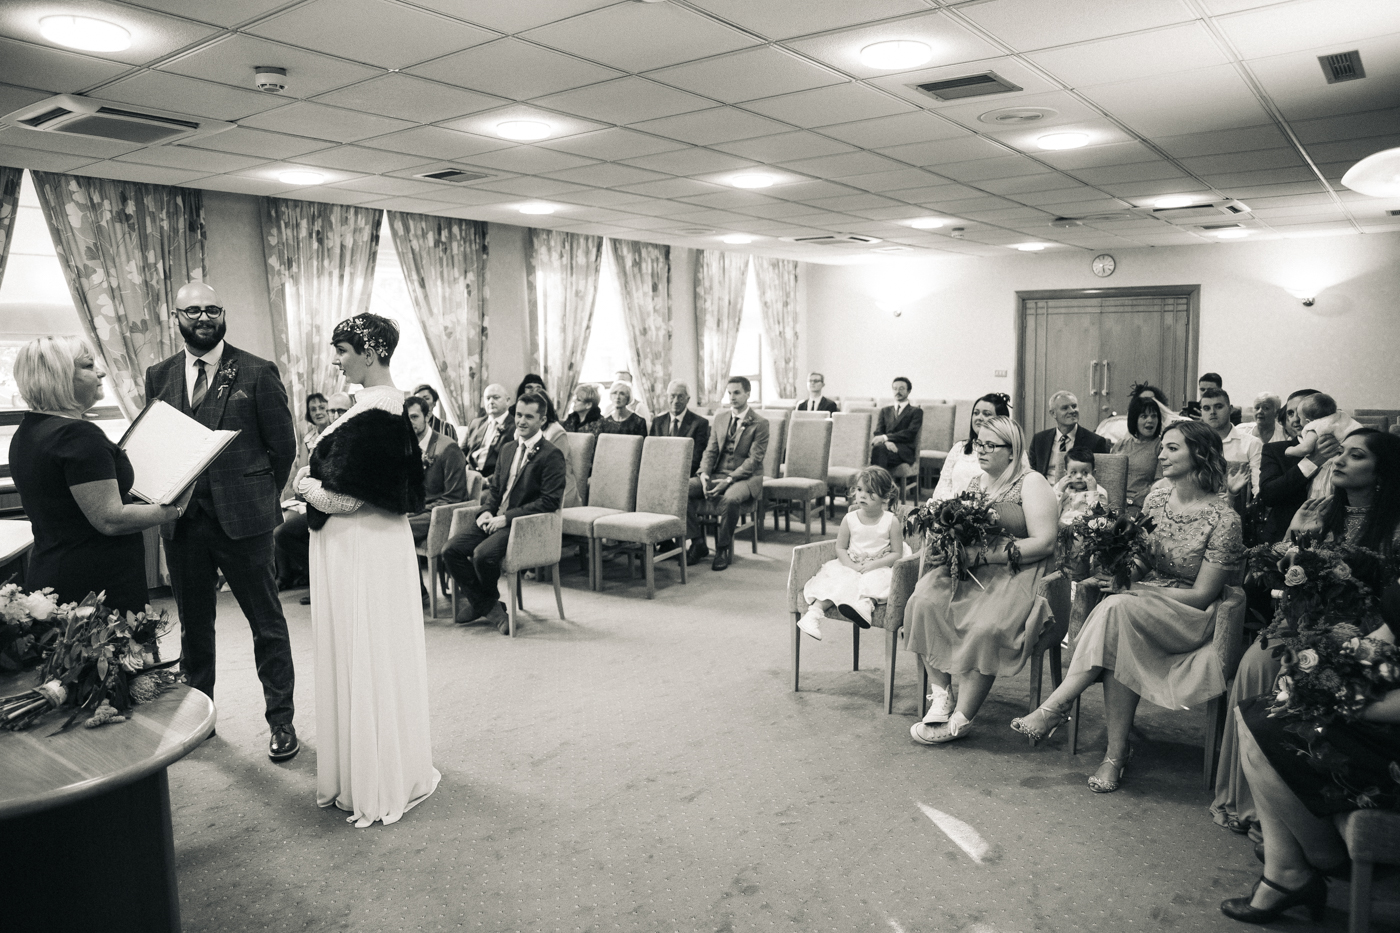 teesside-newcastle-gateshead-wedding-photography-photographer-creative-0036.jpg